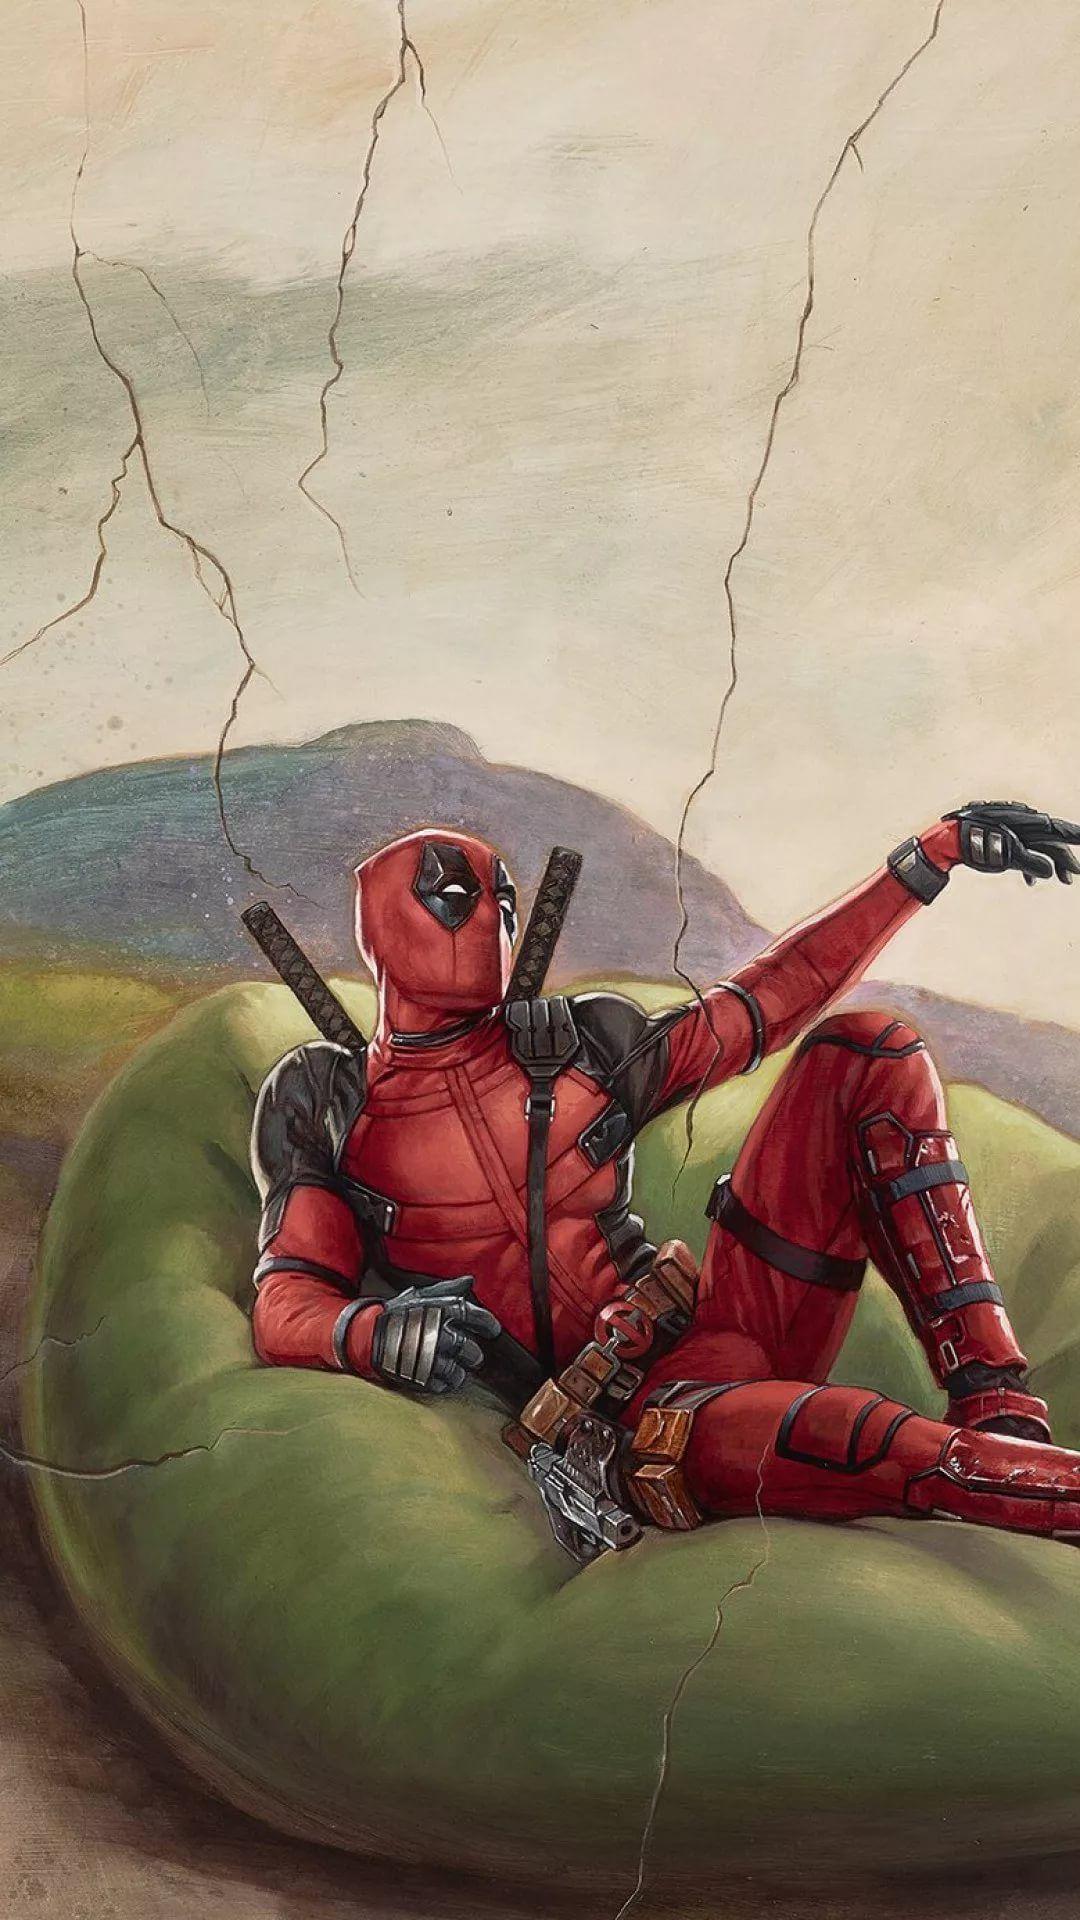 Deadpool wallpaper for iPhone